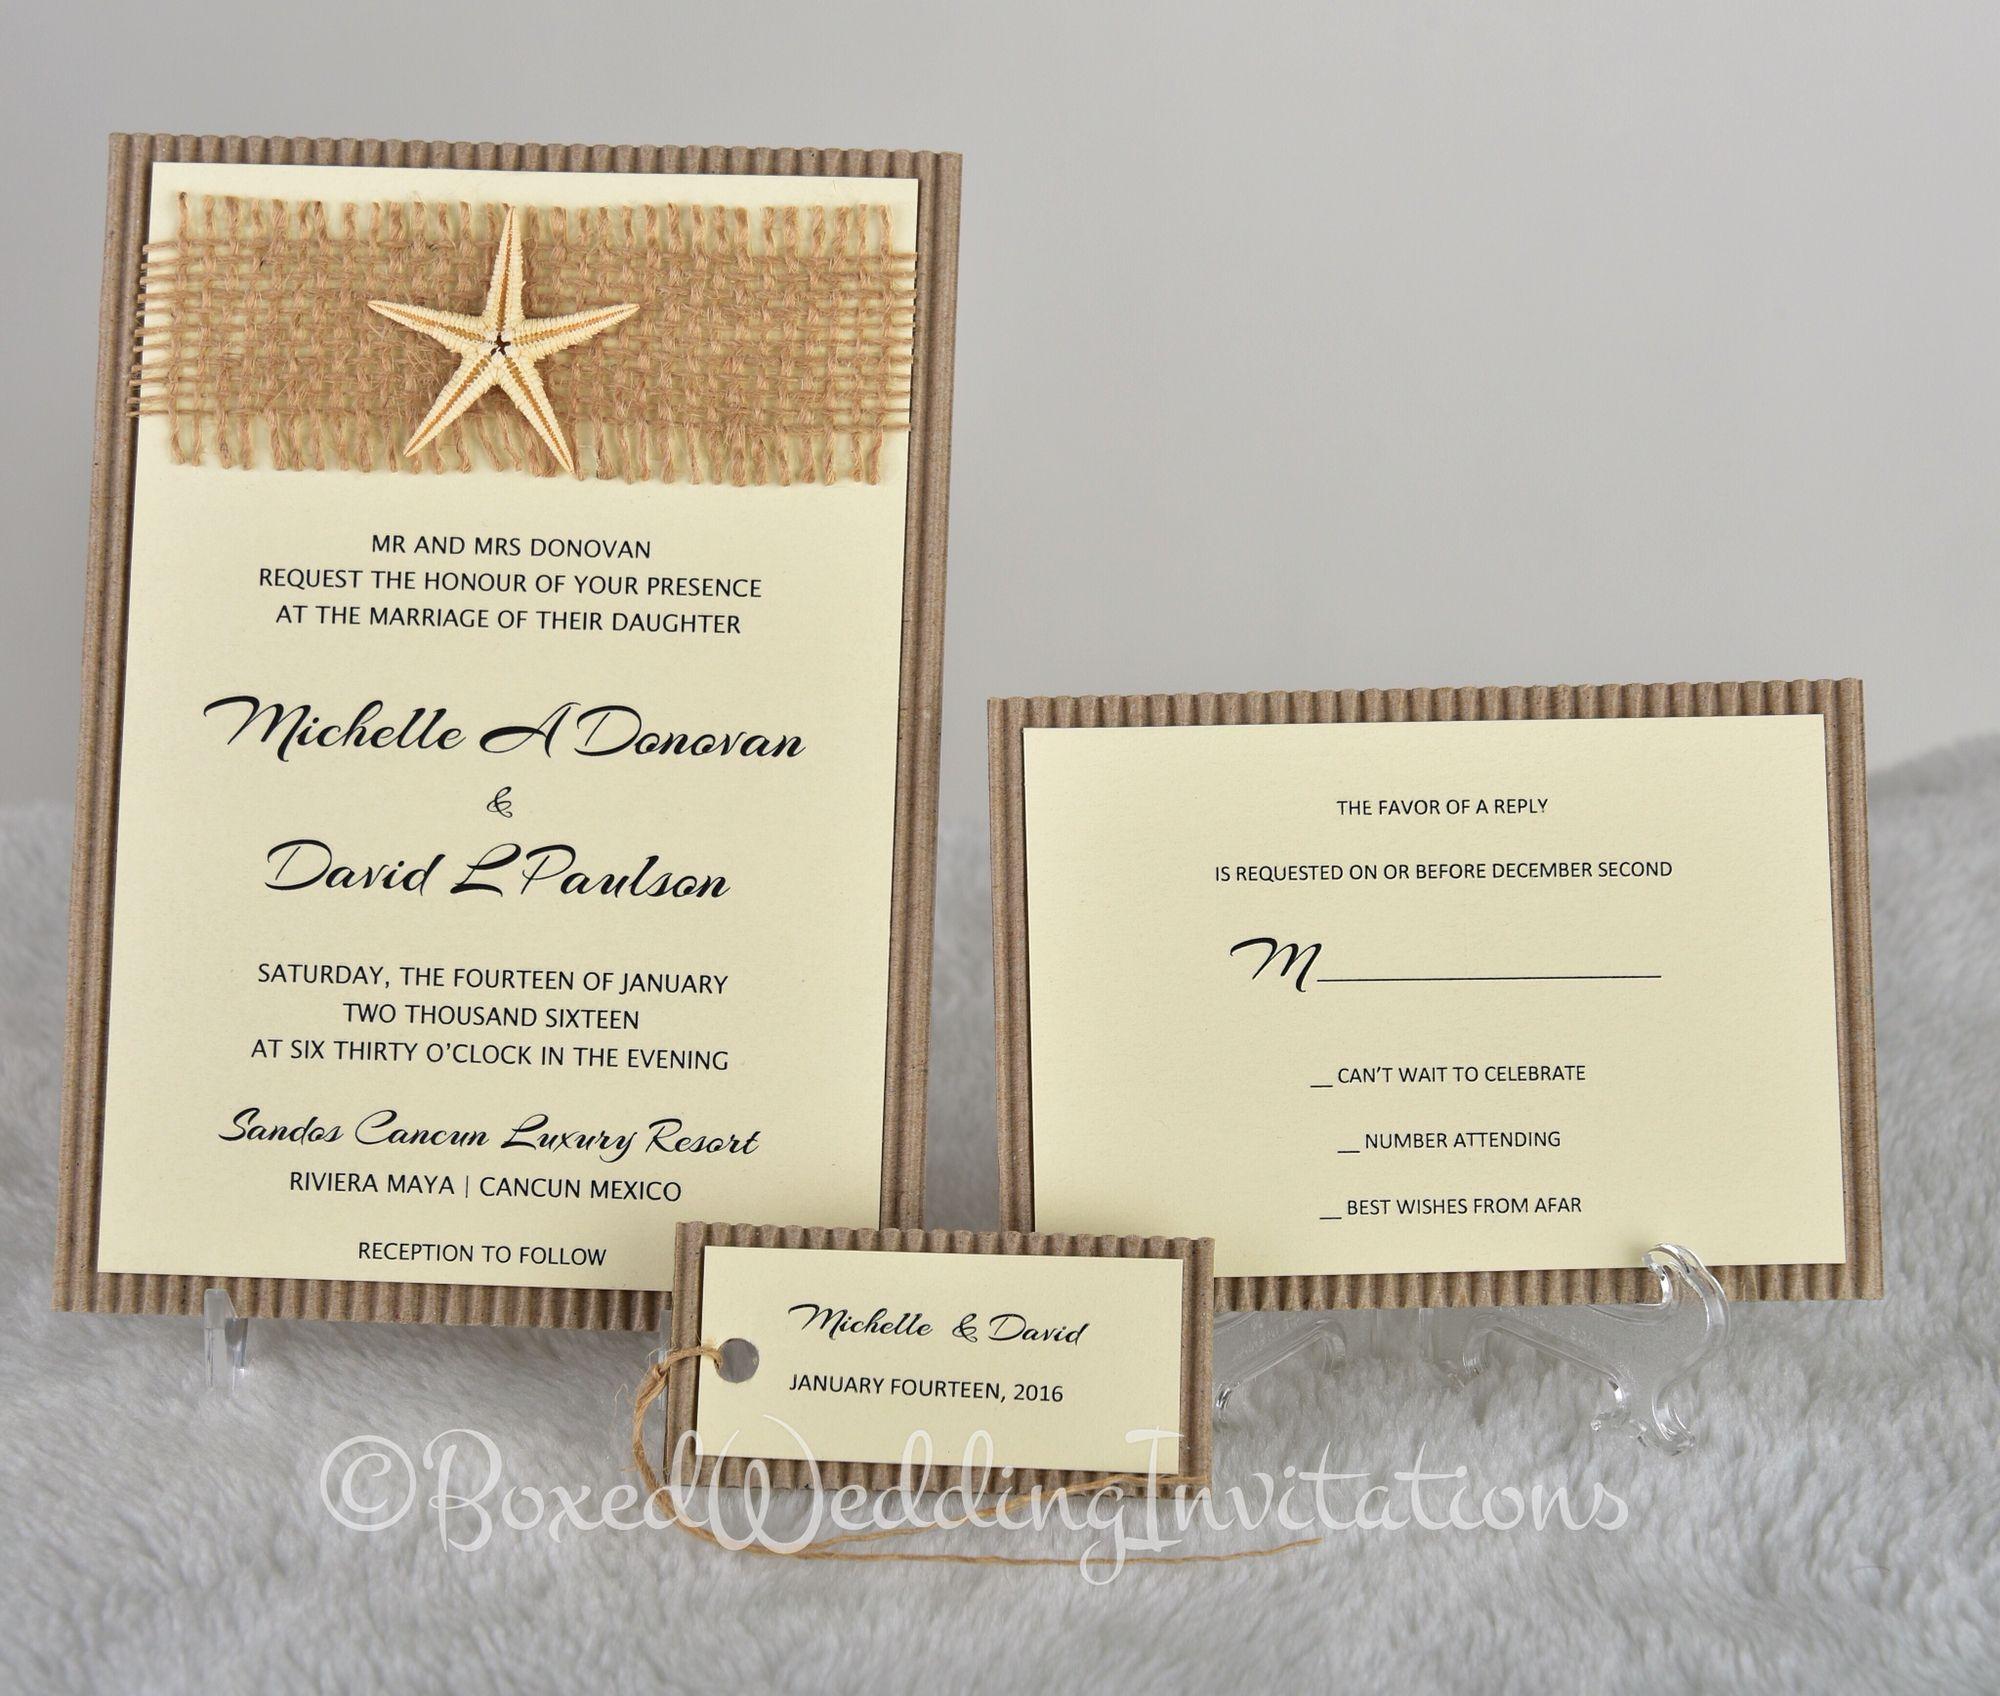 Destination wedding invitation card #wedding #invitation ...